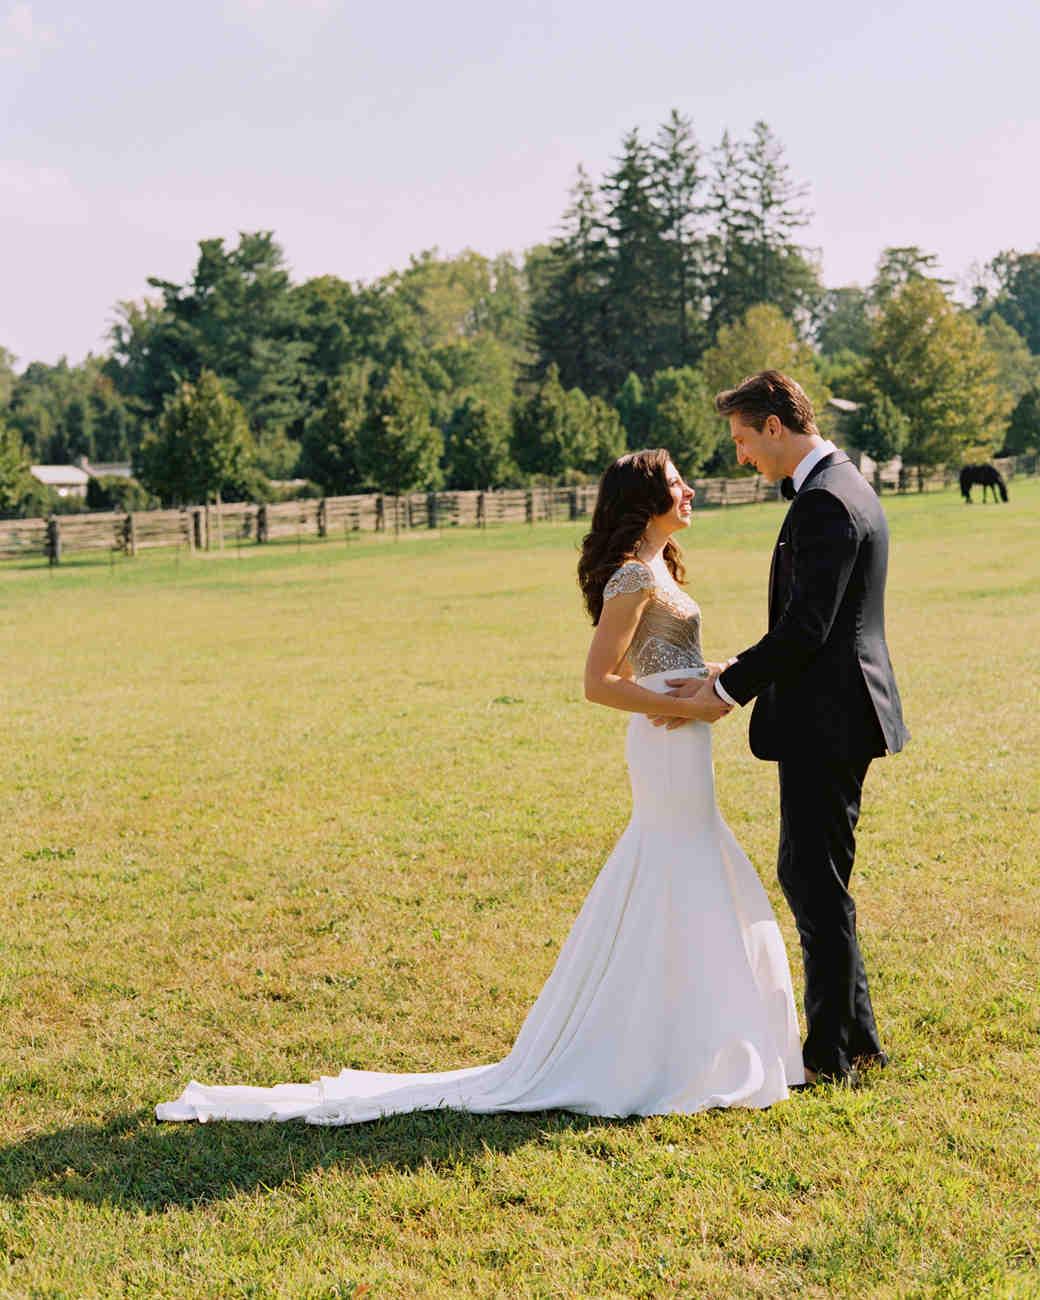 kristina-barrett-wedding-martha-farm-cl11c16-r01-011-d112491.jpg